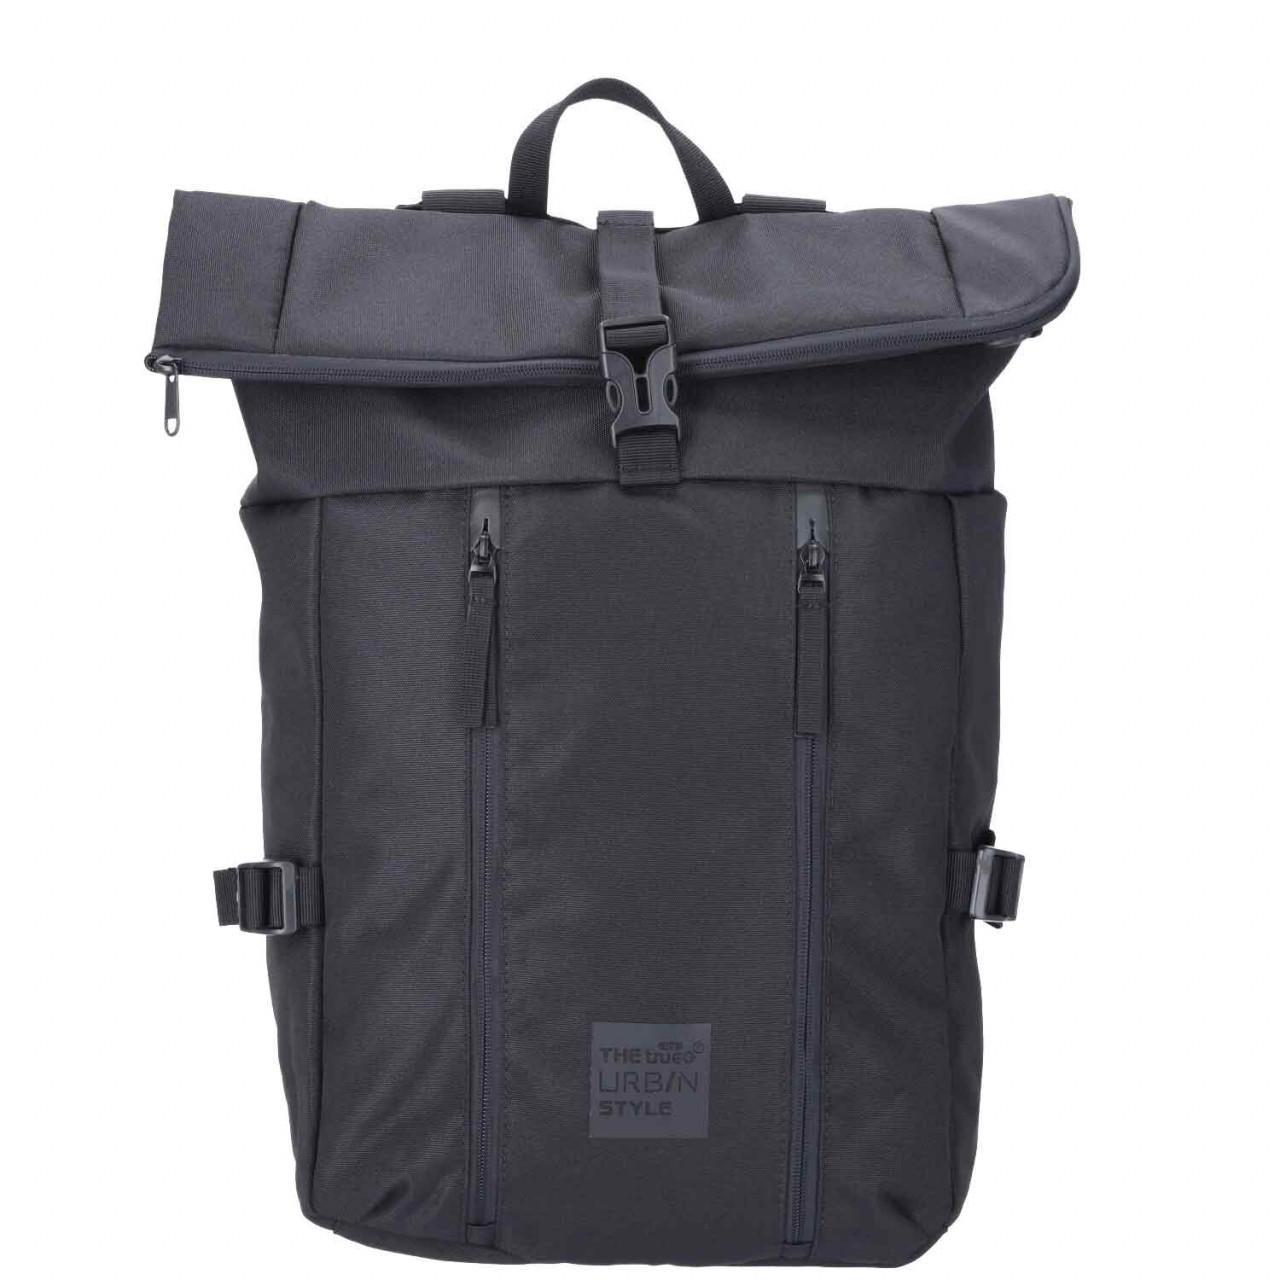 TheTrueC Backpack Urban Line James black